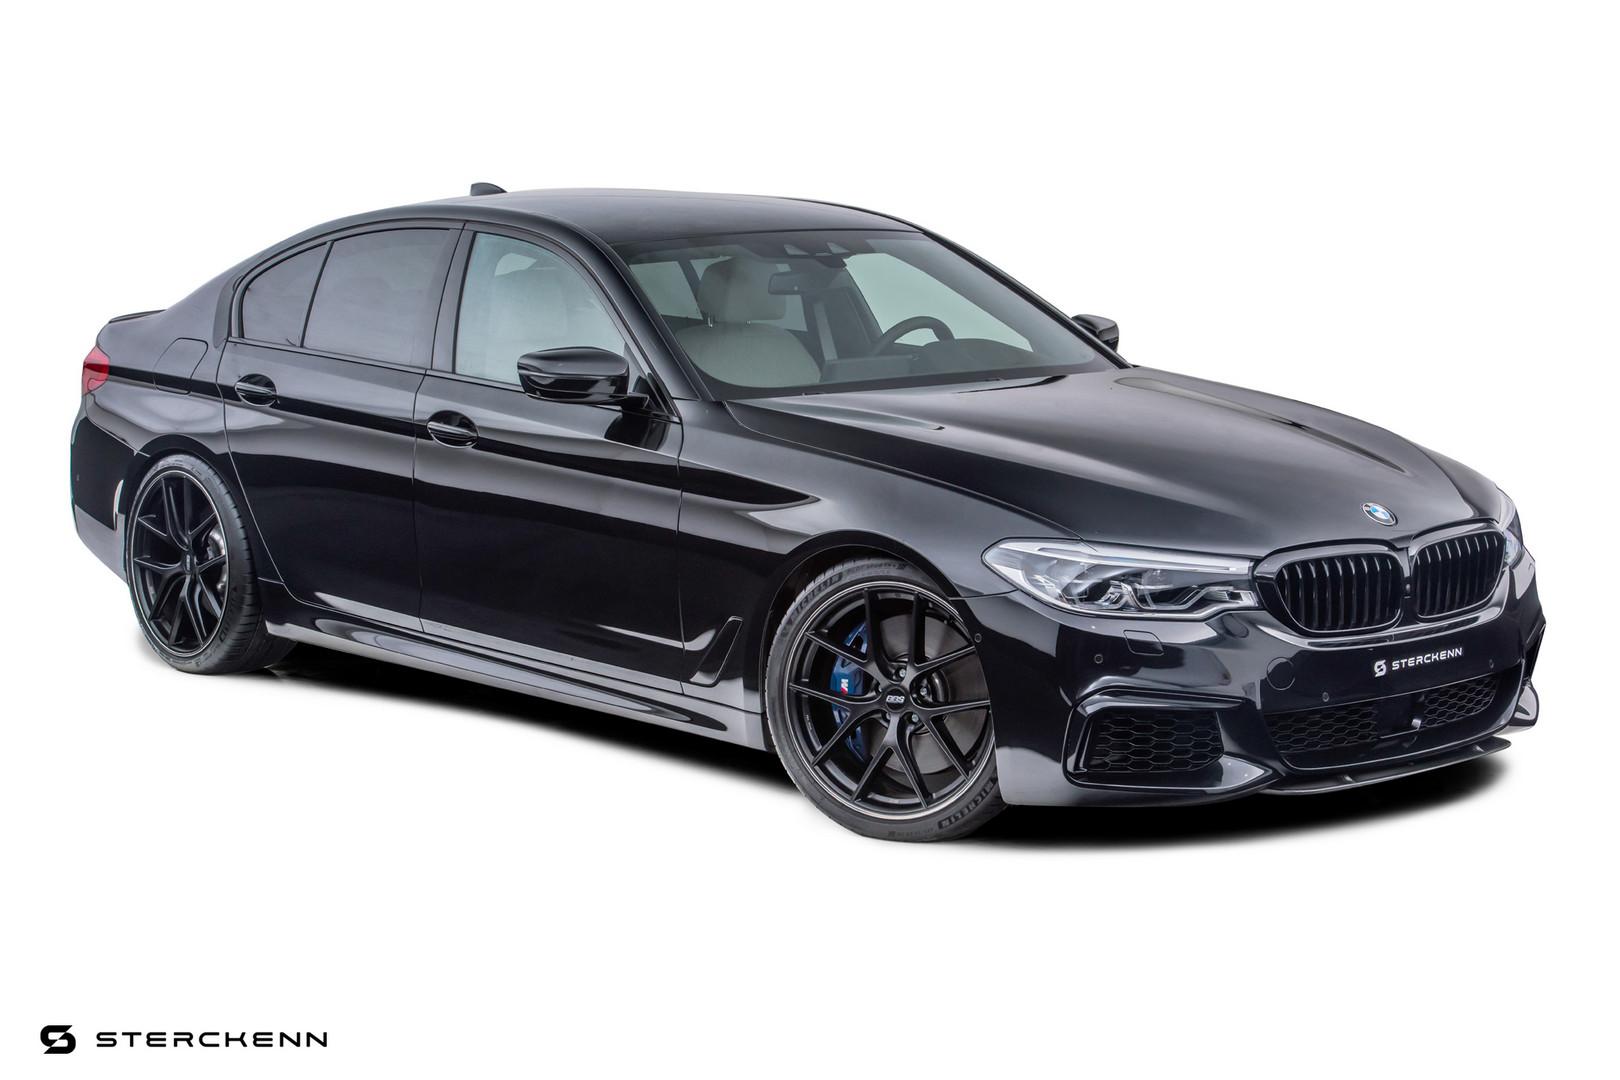 BMW-G30-Side-View